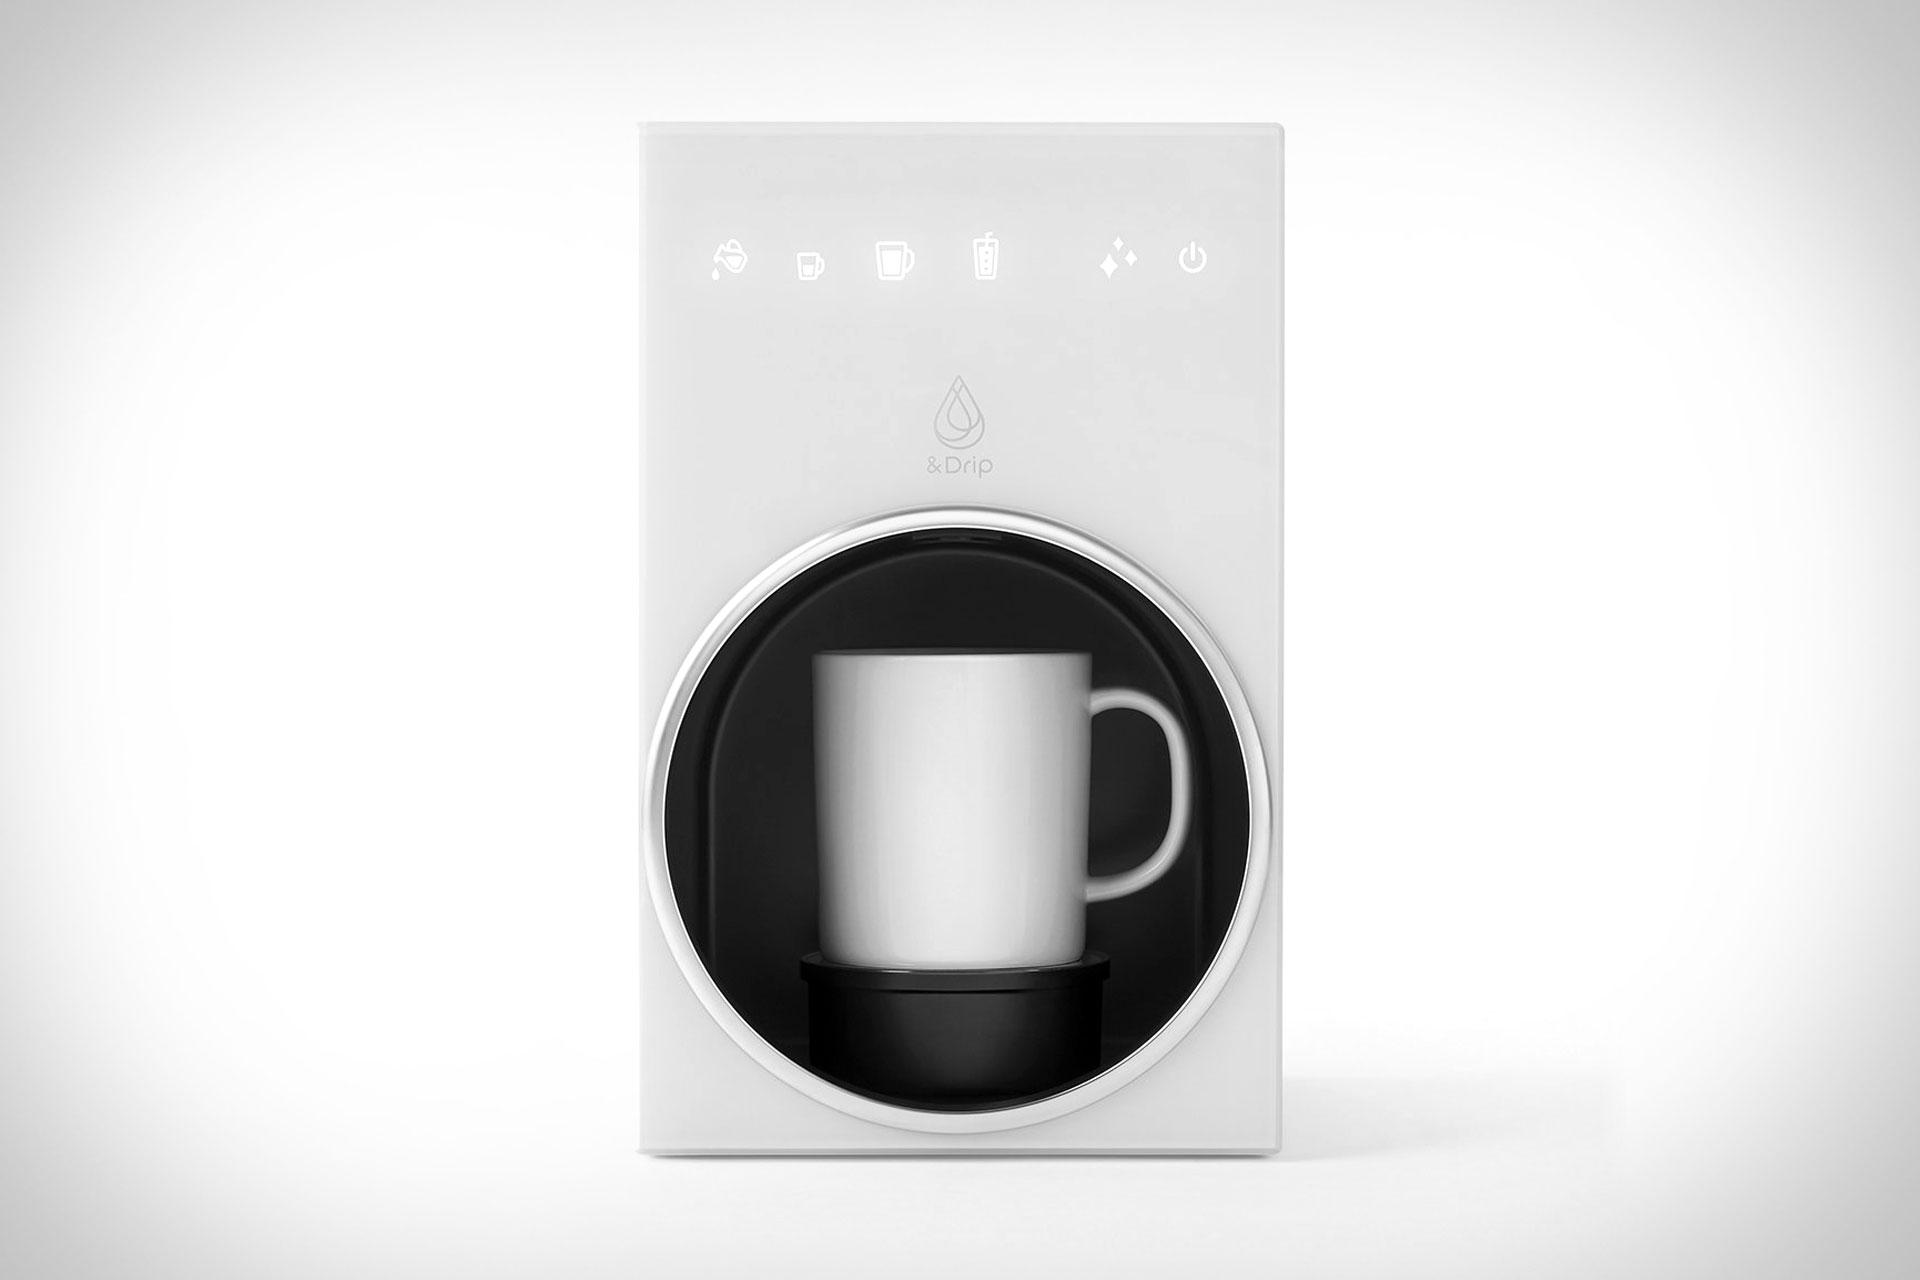 Coca-Cola &Drip Coffee Machine